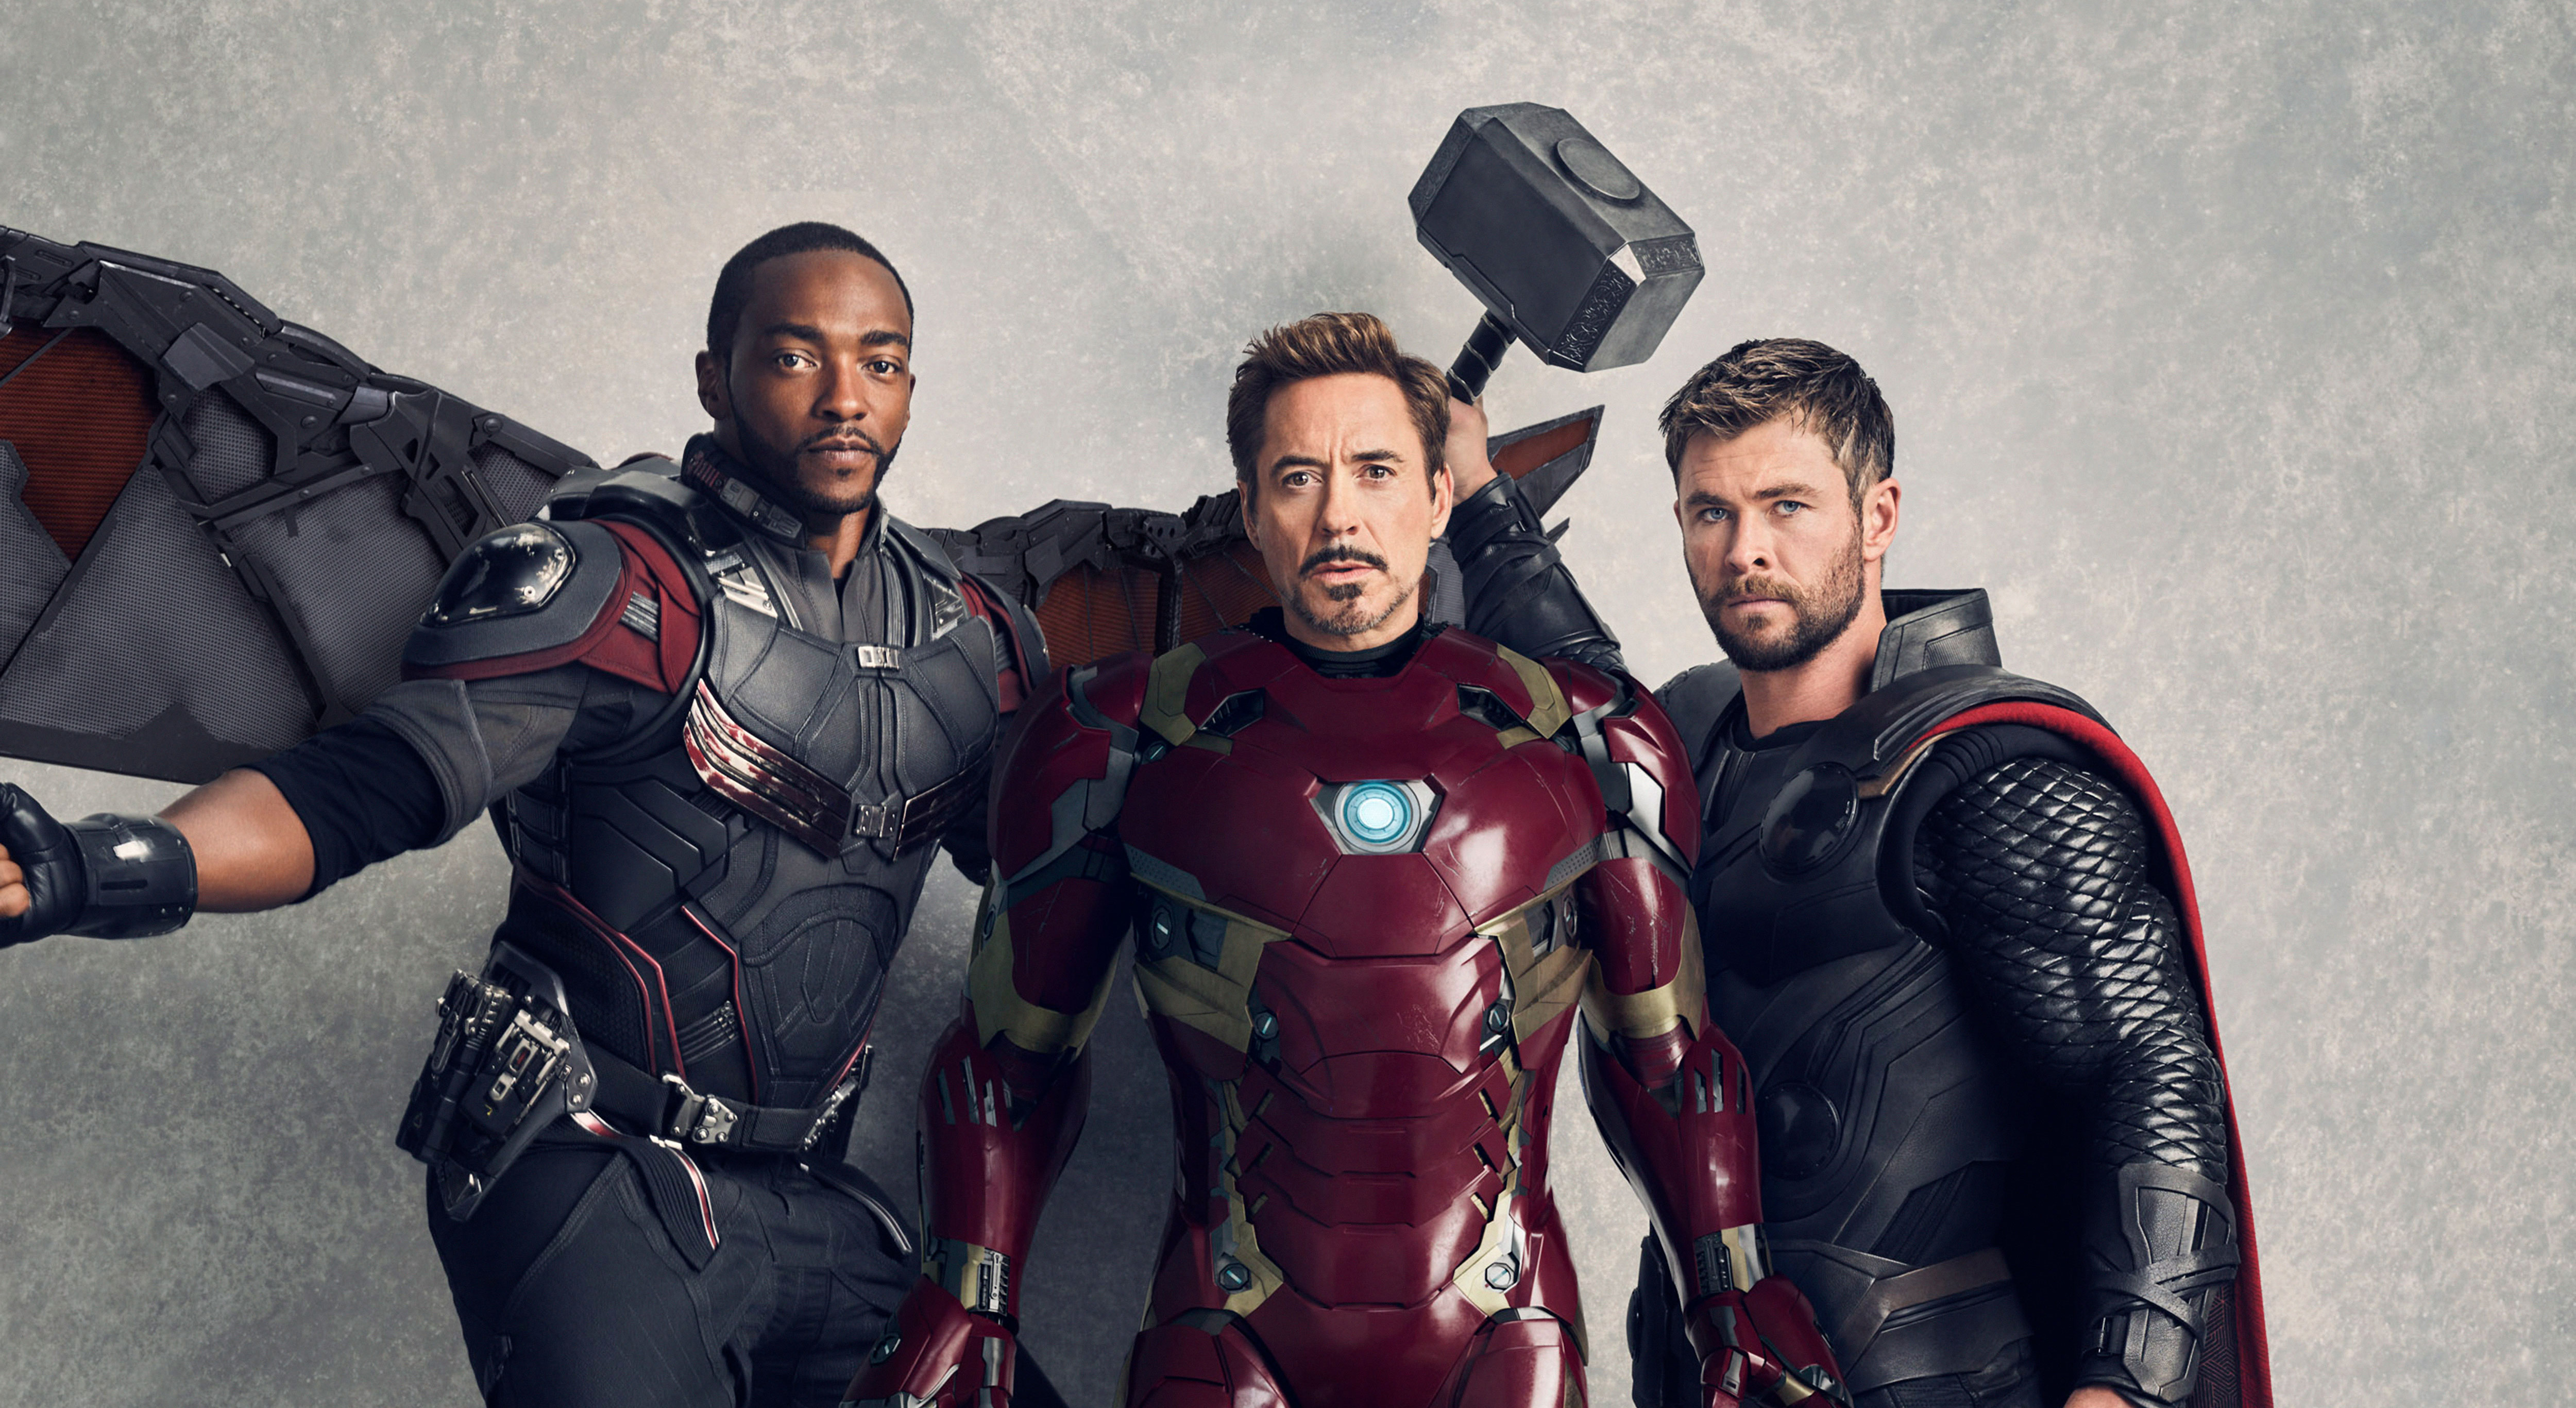 Avengers: Infinity War 4k Ultra HD Wallpaper and ...